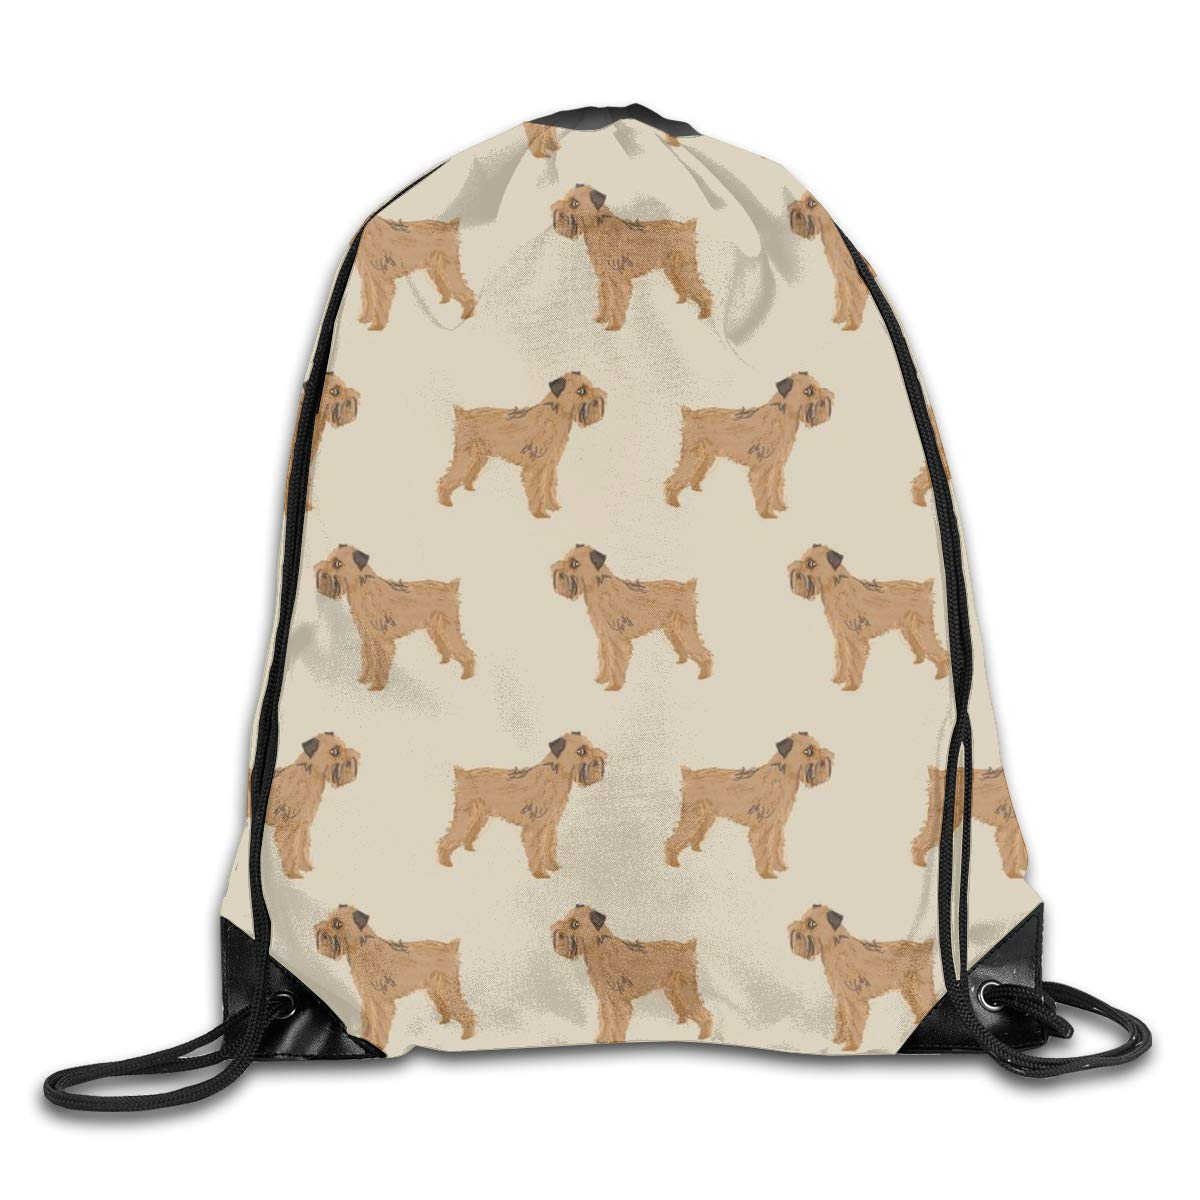 Brussels Griffon Dog Standing Dogs Khaki Neutral Dog Design Pet Dog Drawstring Gym Bag for Women and Men Polyester Gym Sack String Backpack for Sport Workout, School, Travel, Books 14.17 X 16.9 inch